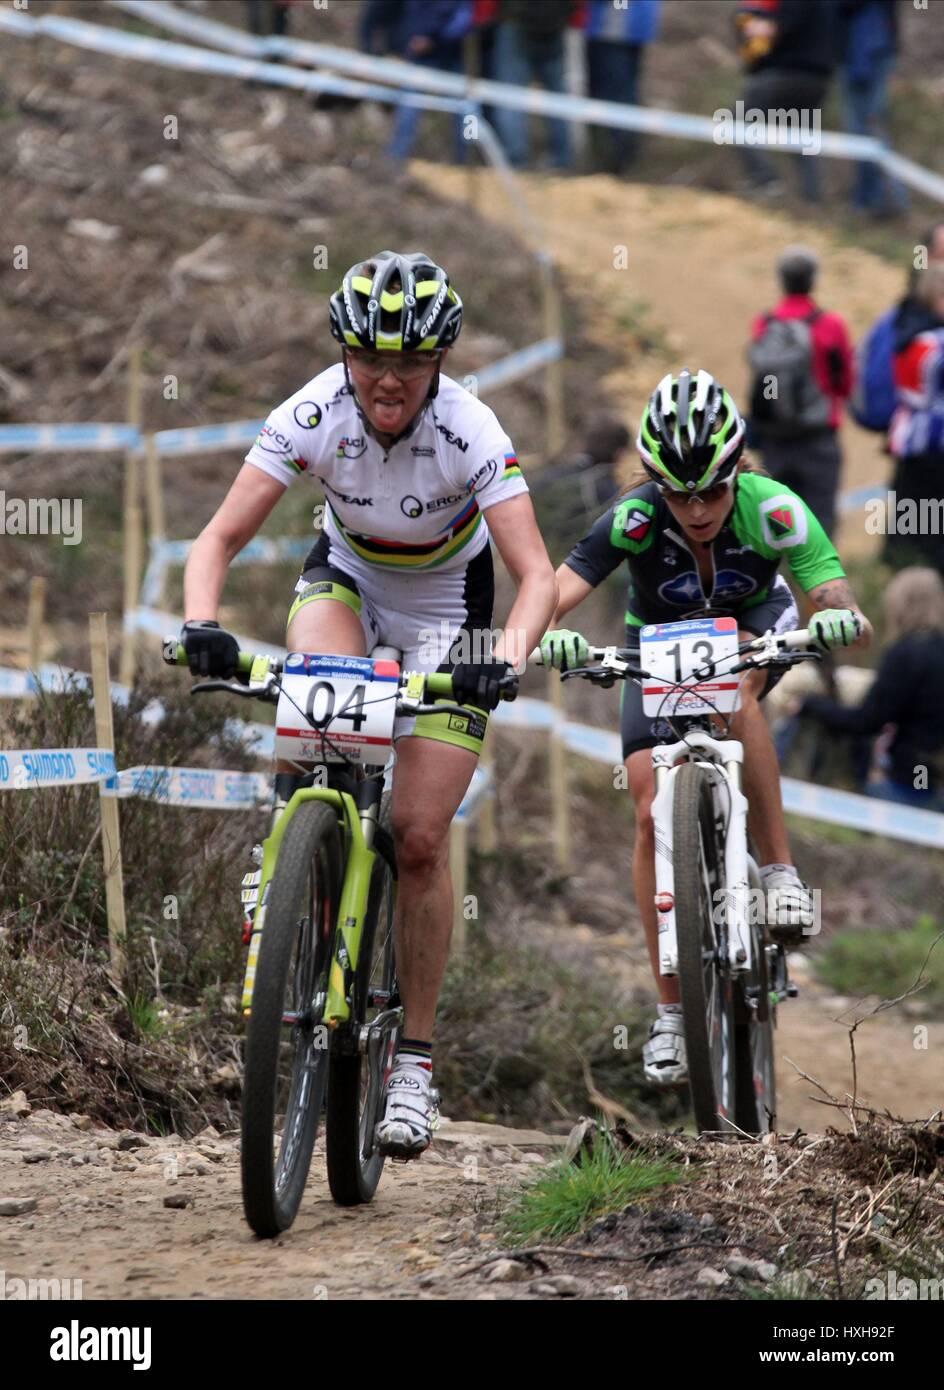 IRINA KALENTIEVA UCI MOUNTAIN BIKE WORLD CUP DALBY FOREST ...